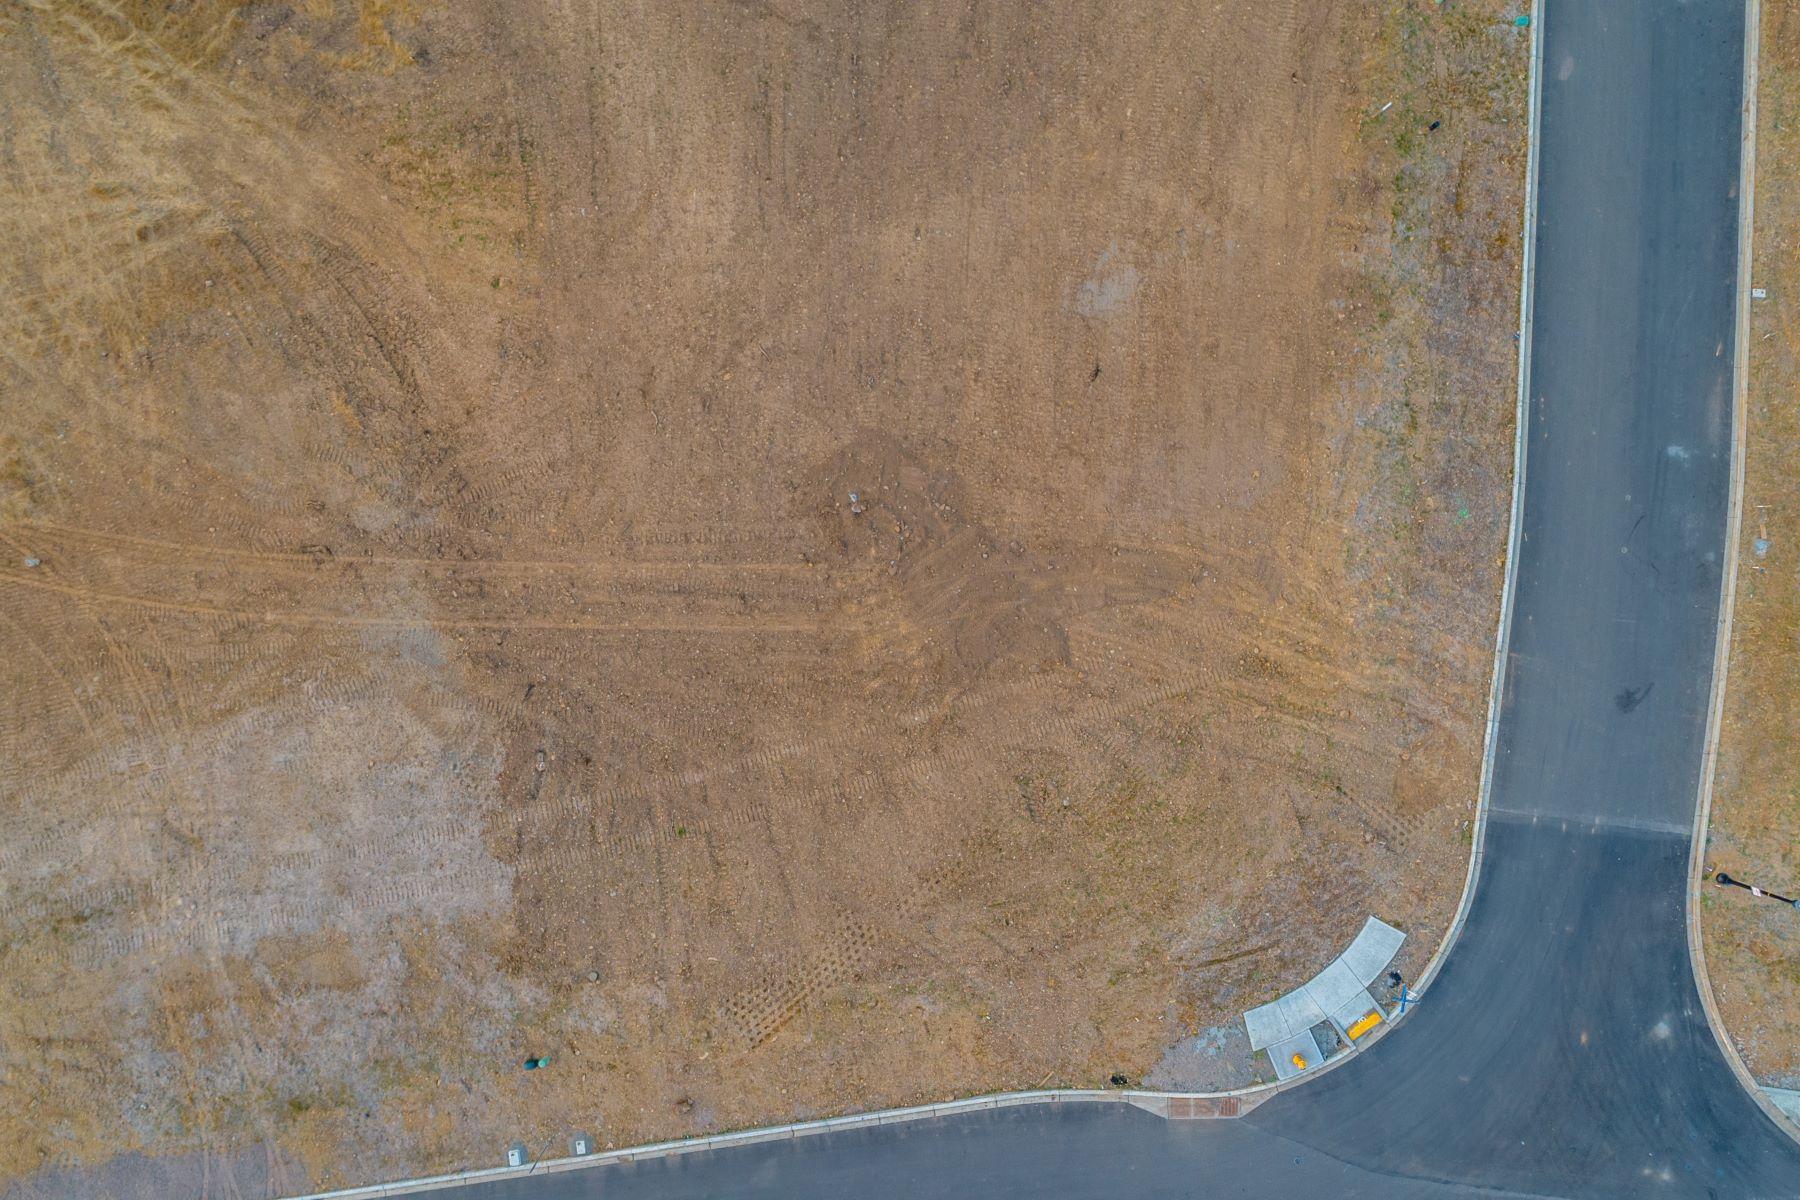 Land for Sale at 3611 NW McMaster DR Camas, Washington 98607 United States